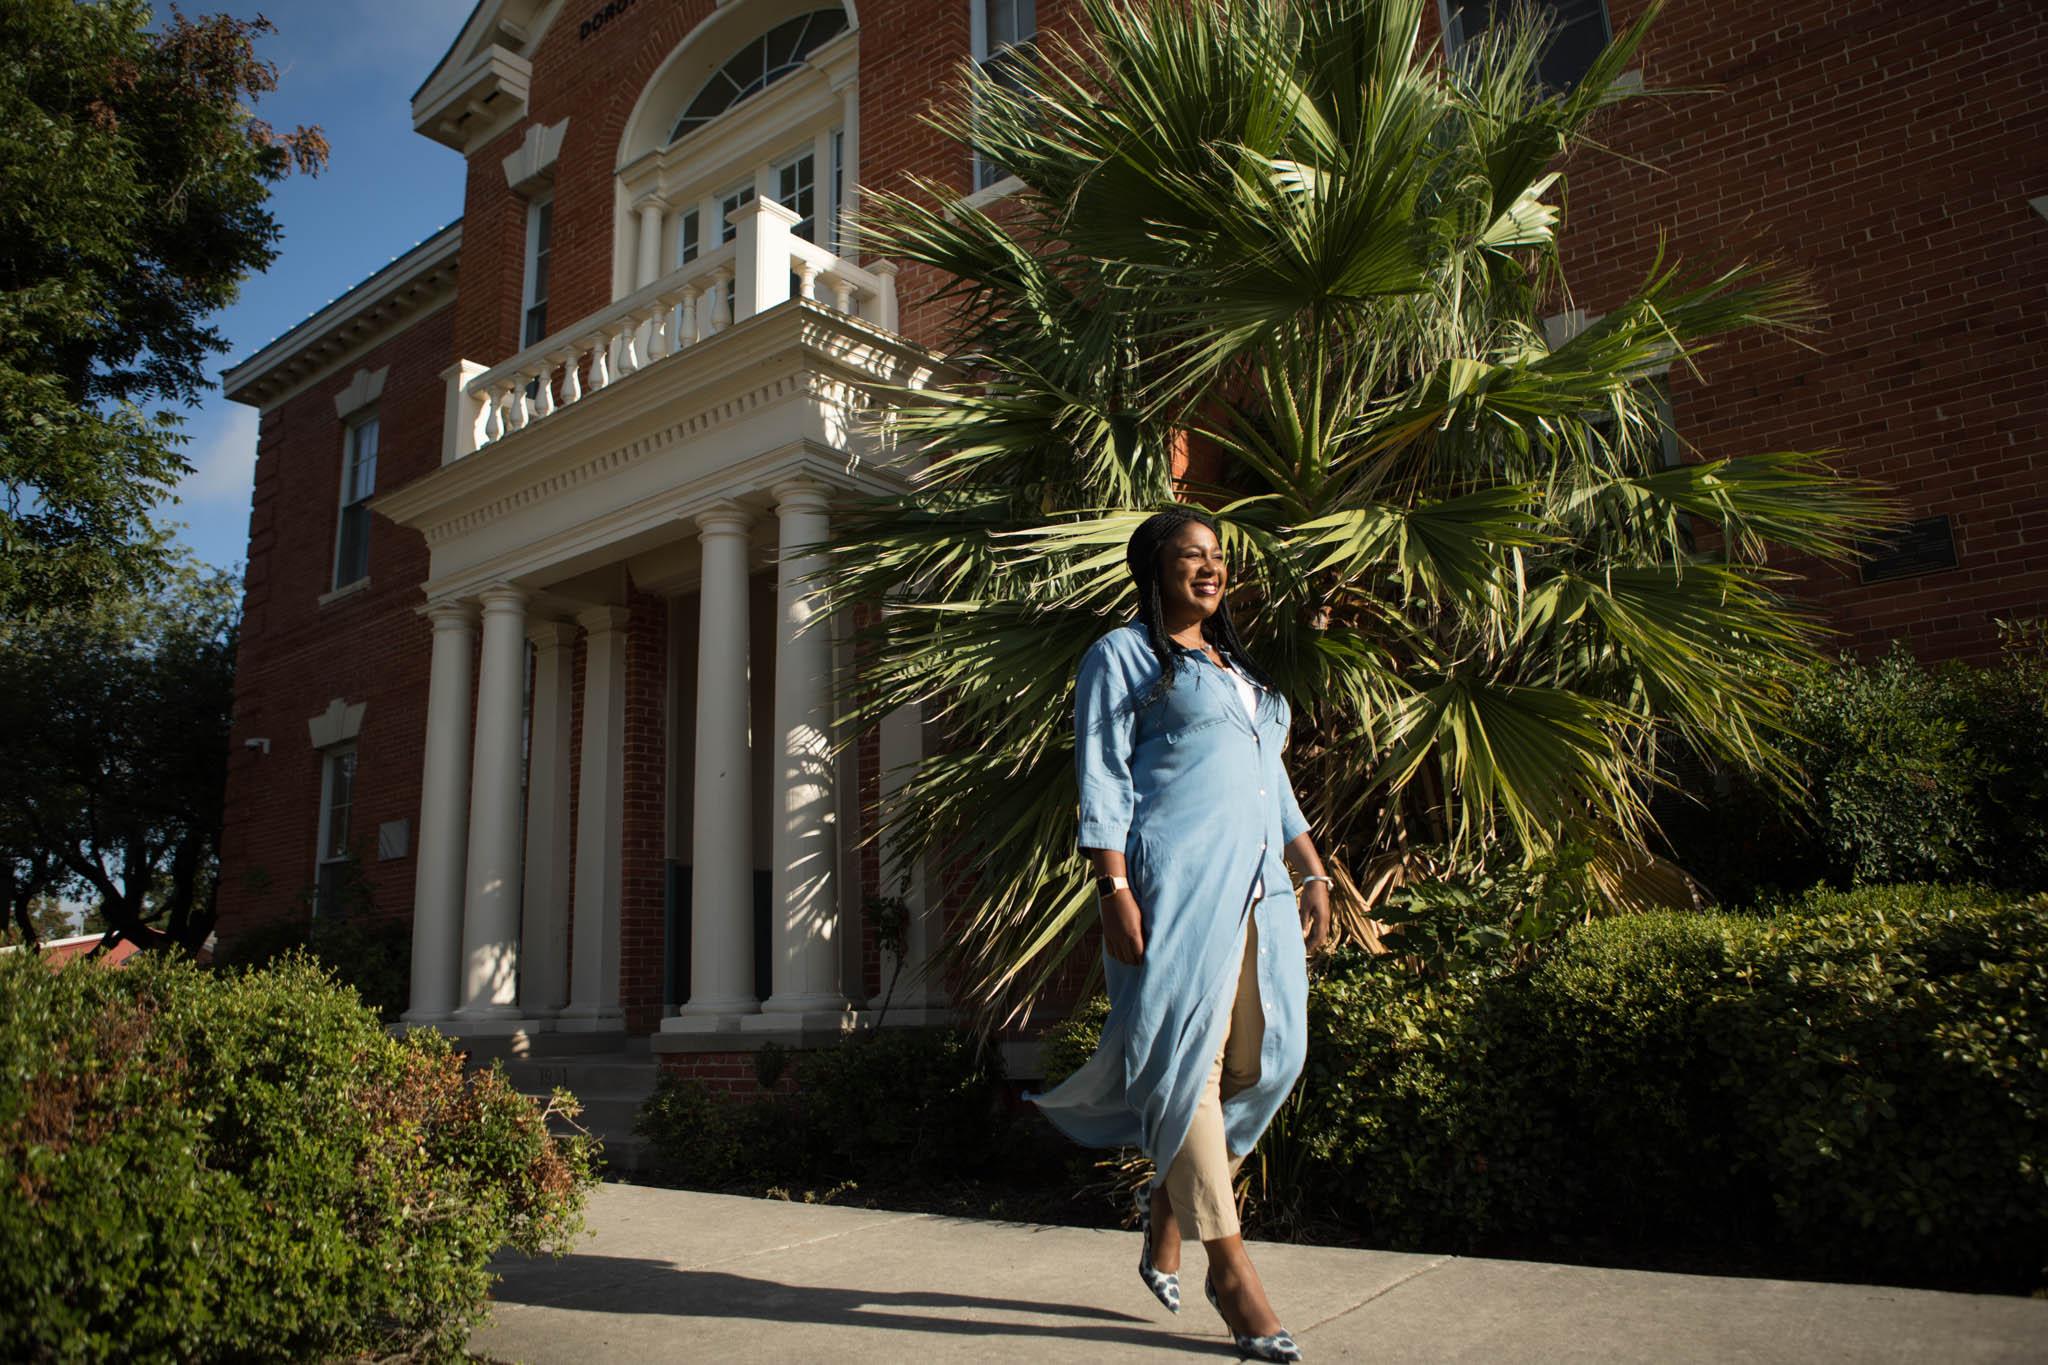 SAISD Chief of Staff Tiffany Grant walks outside of the new Pickett Parent Center.